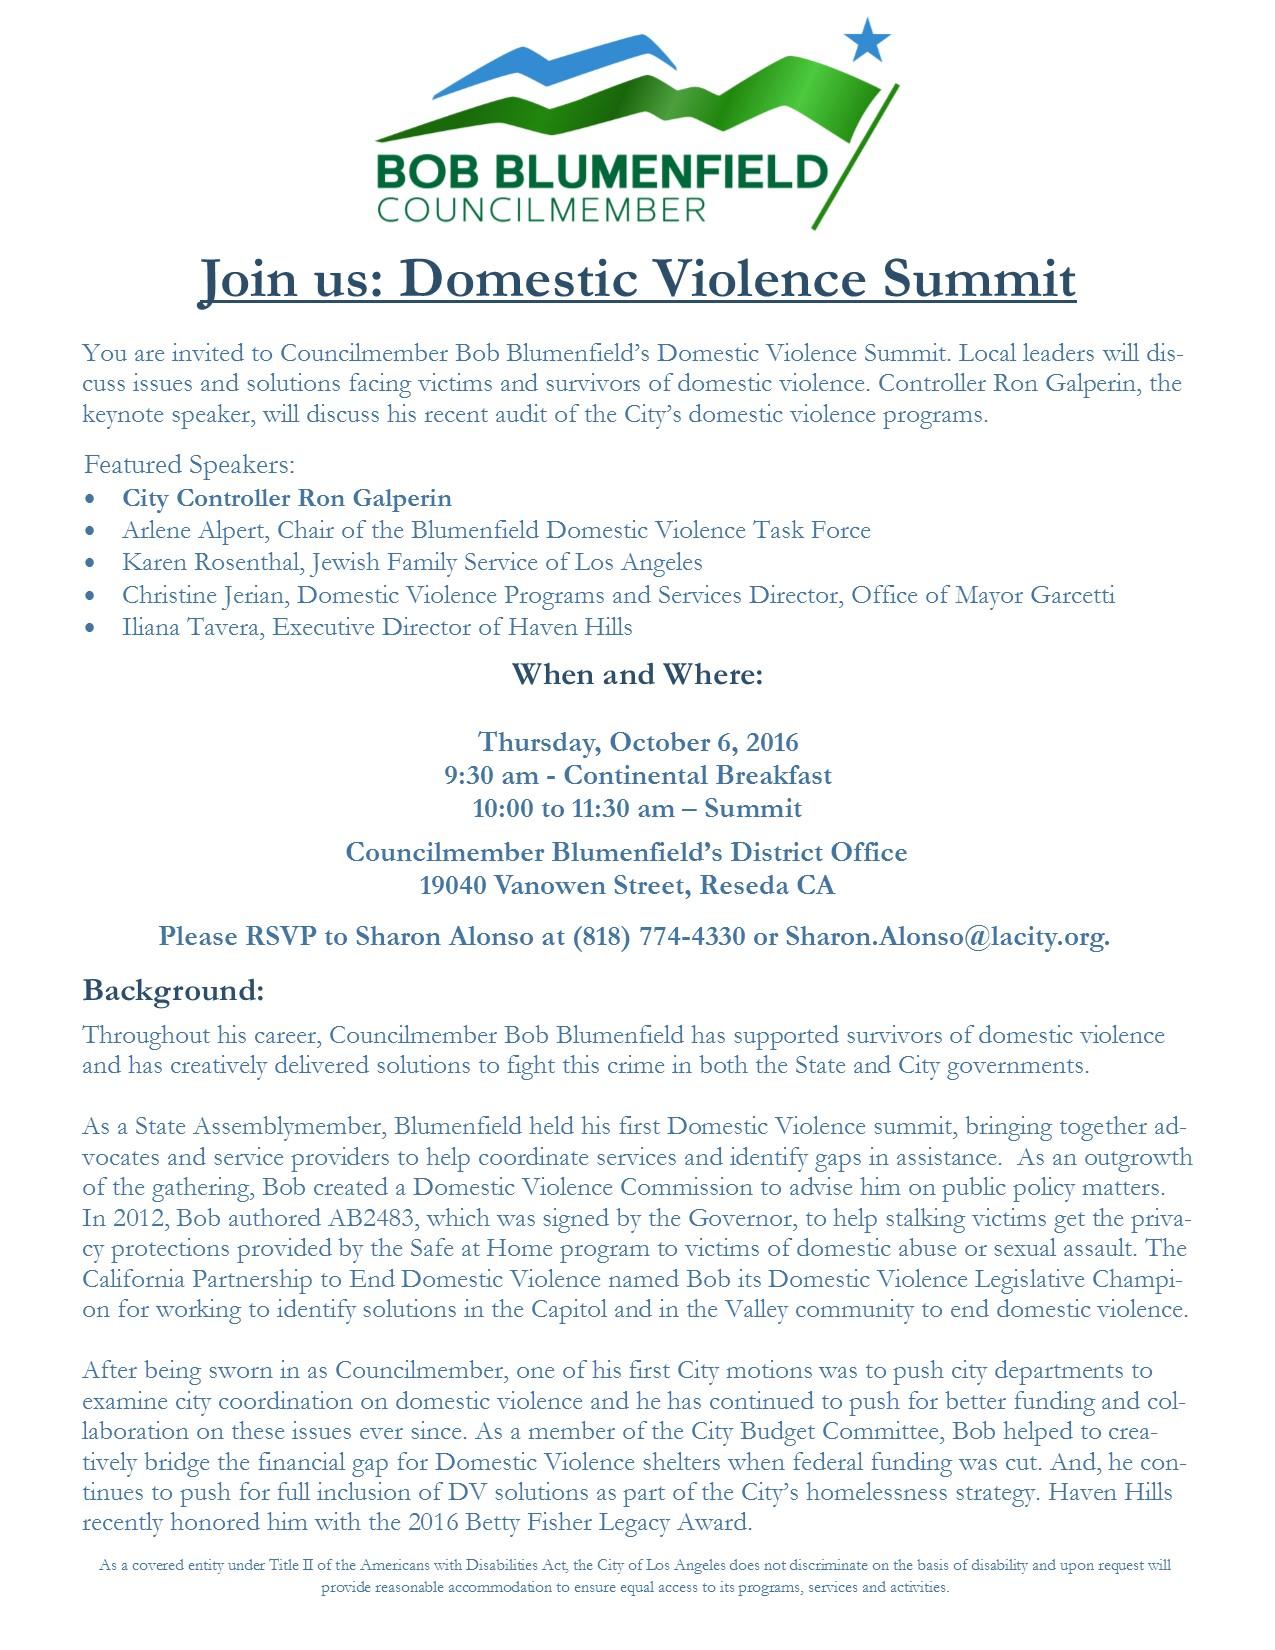 Domestic_Violence_Invite_FINALFINAL.jpg